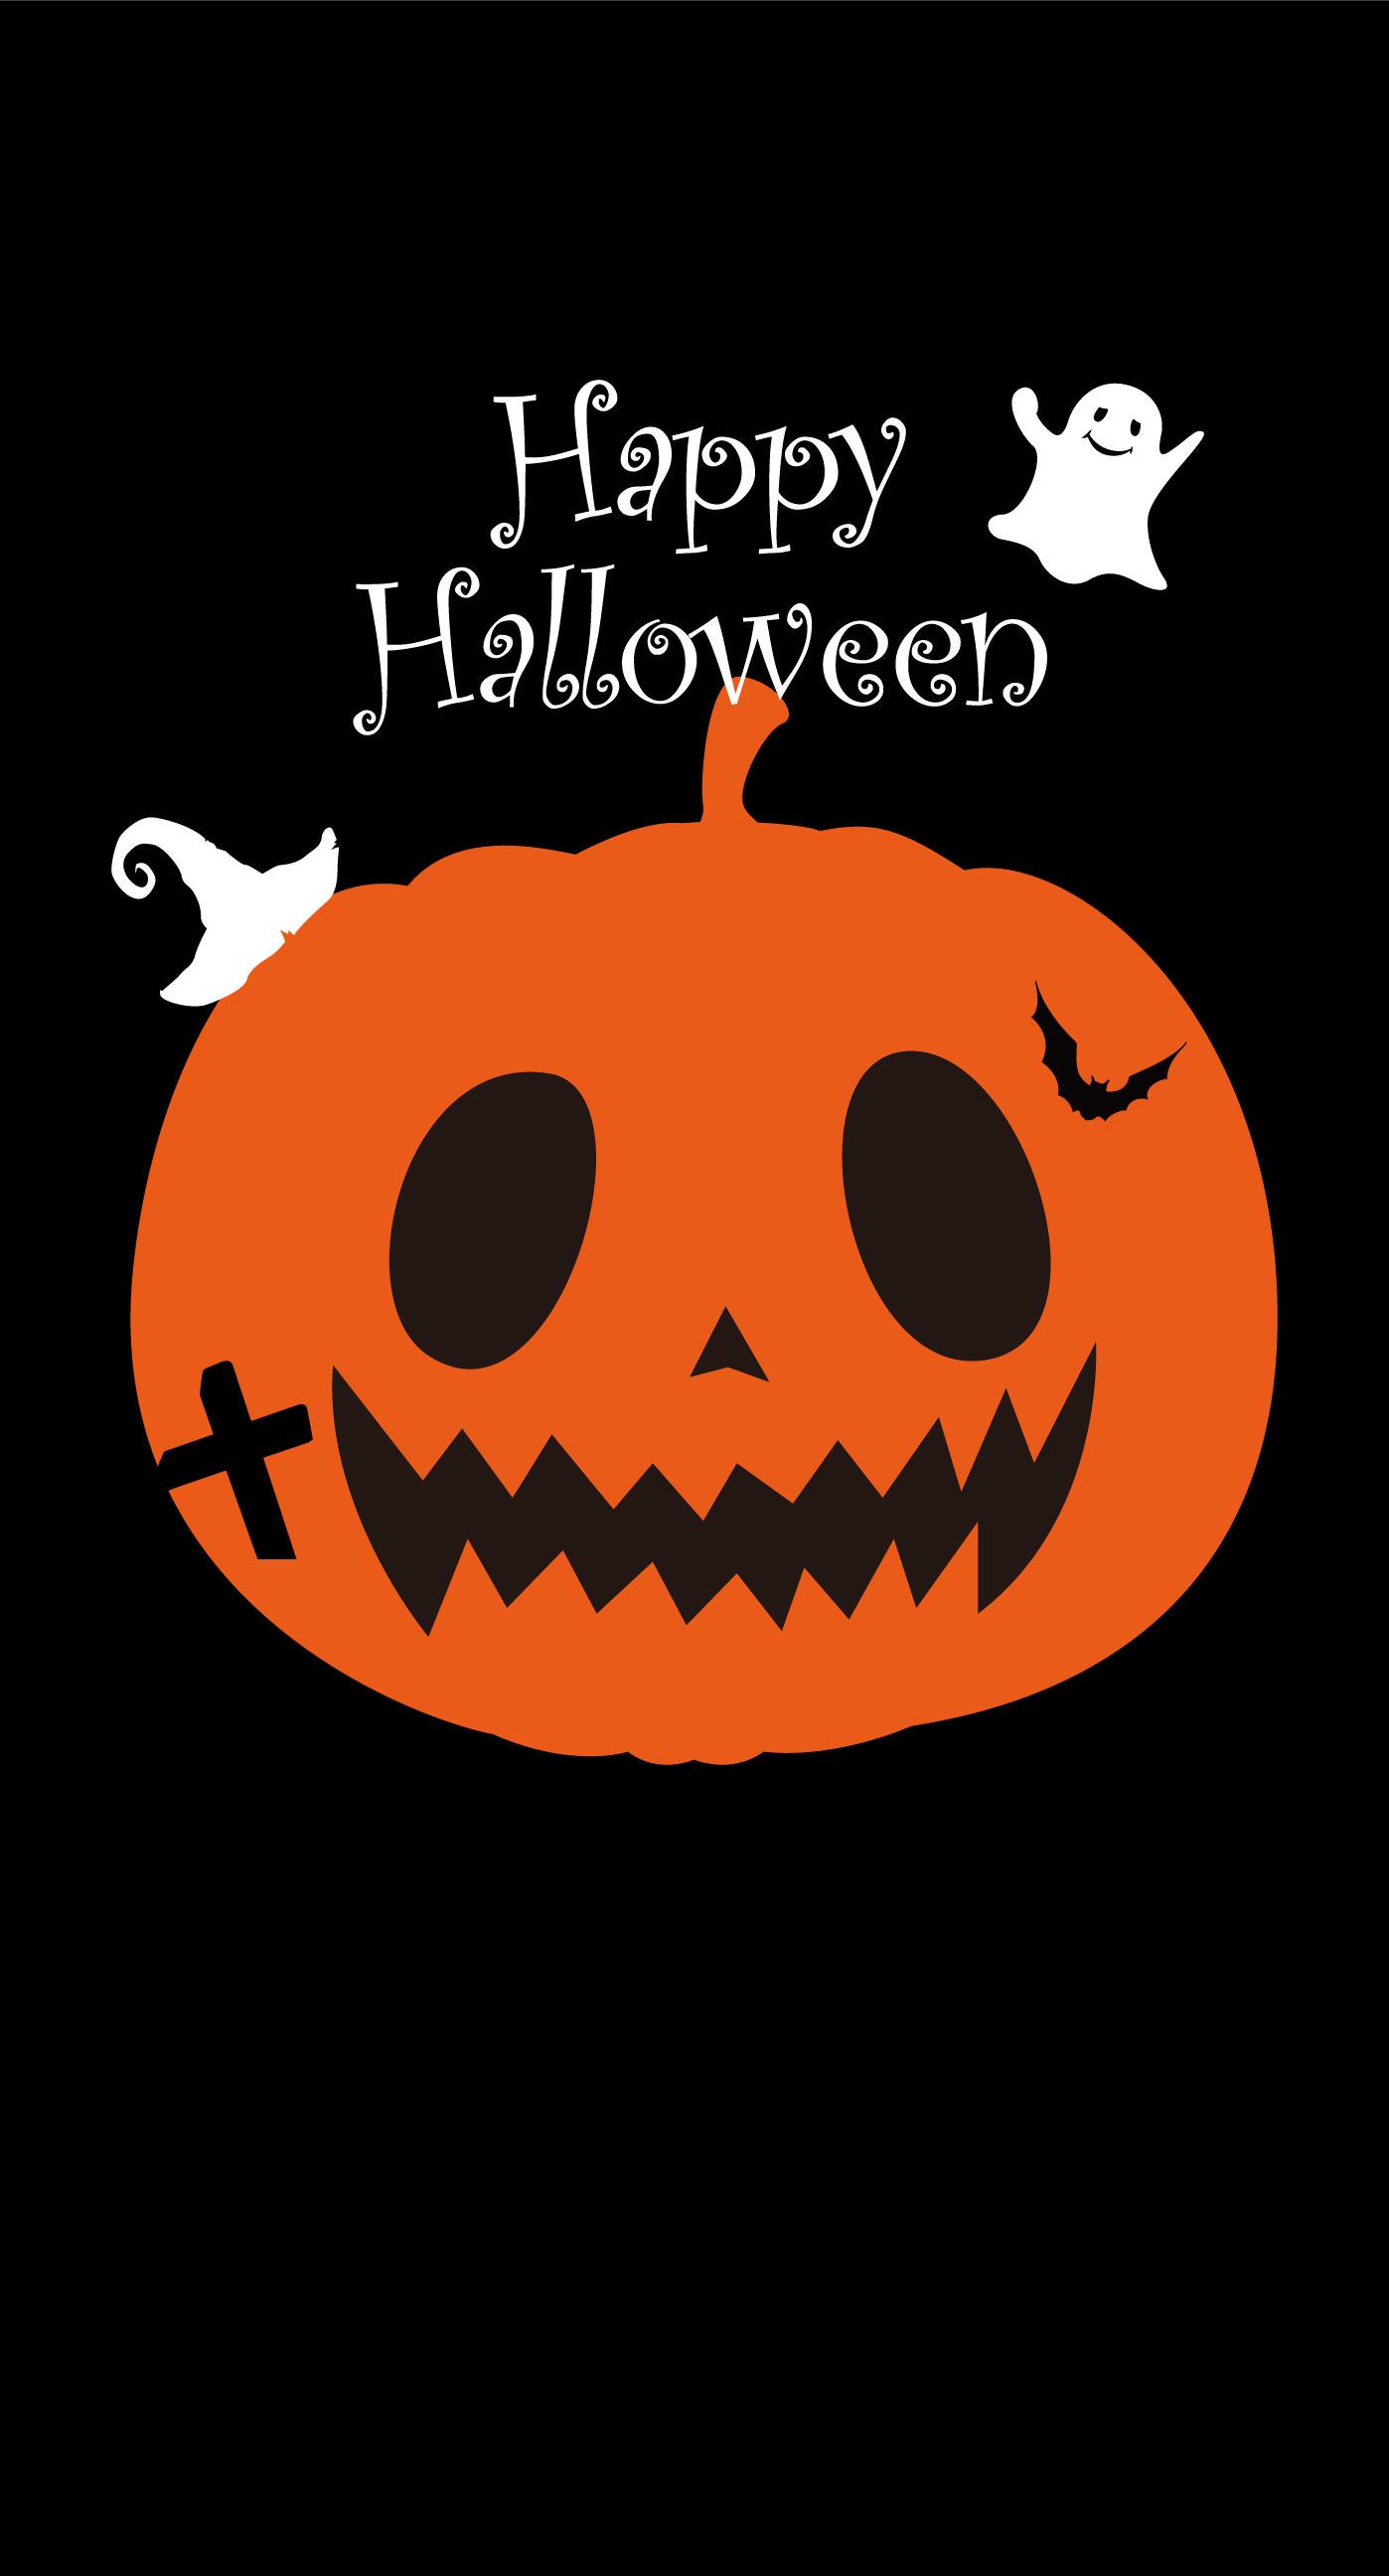 Illustration Halloween Pumpkin Orange Wallpaper Sc Iphone8plus